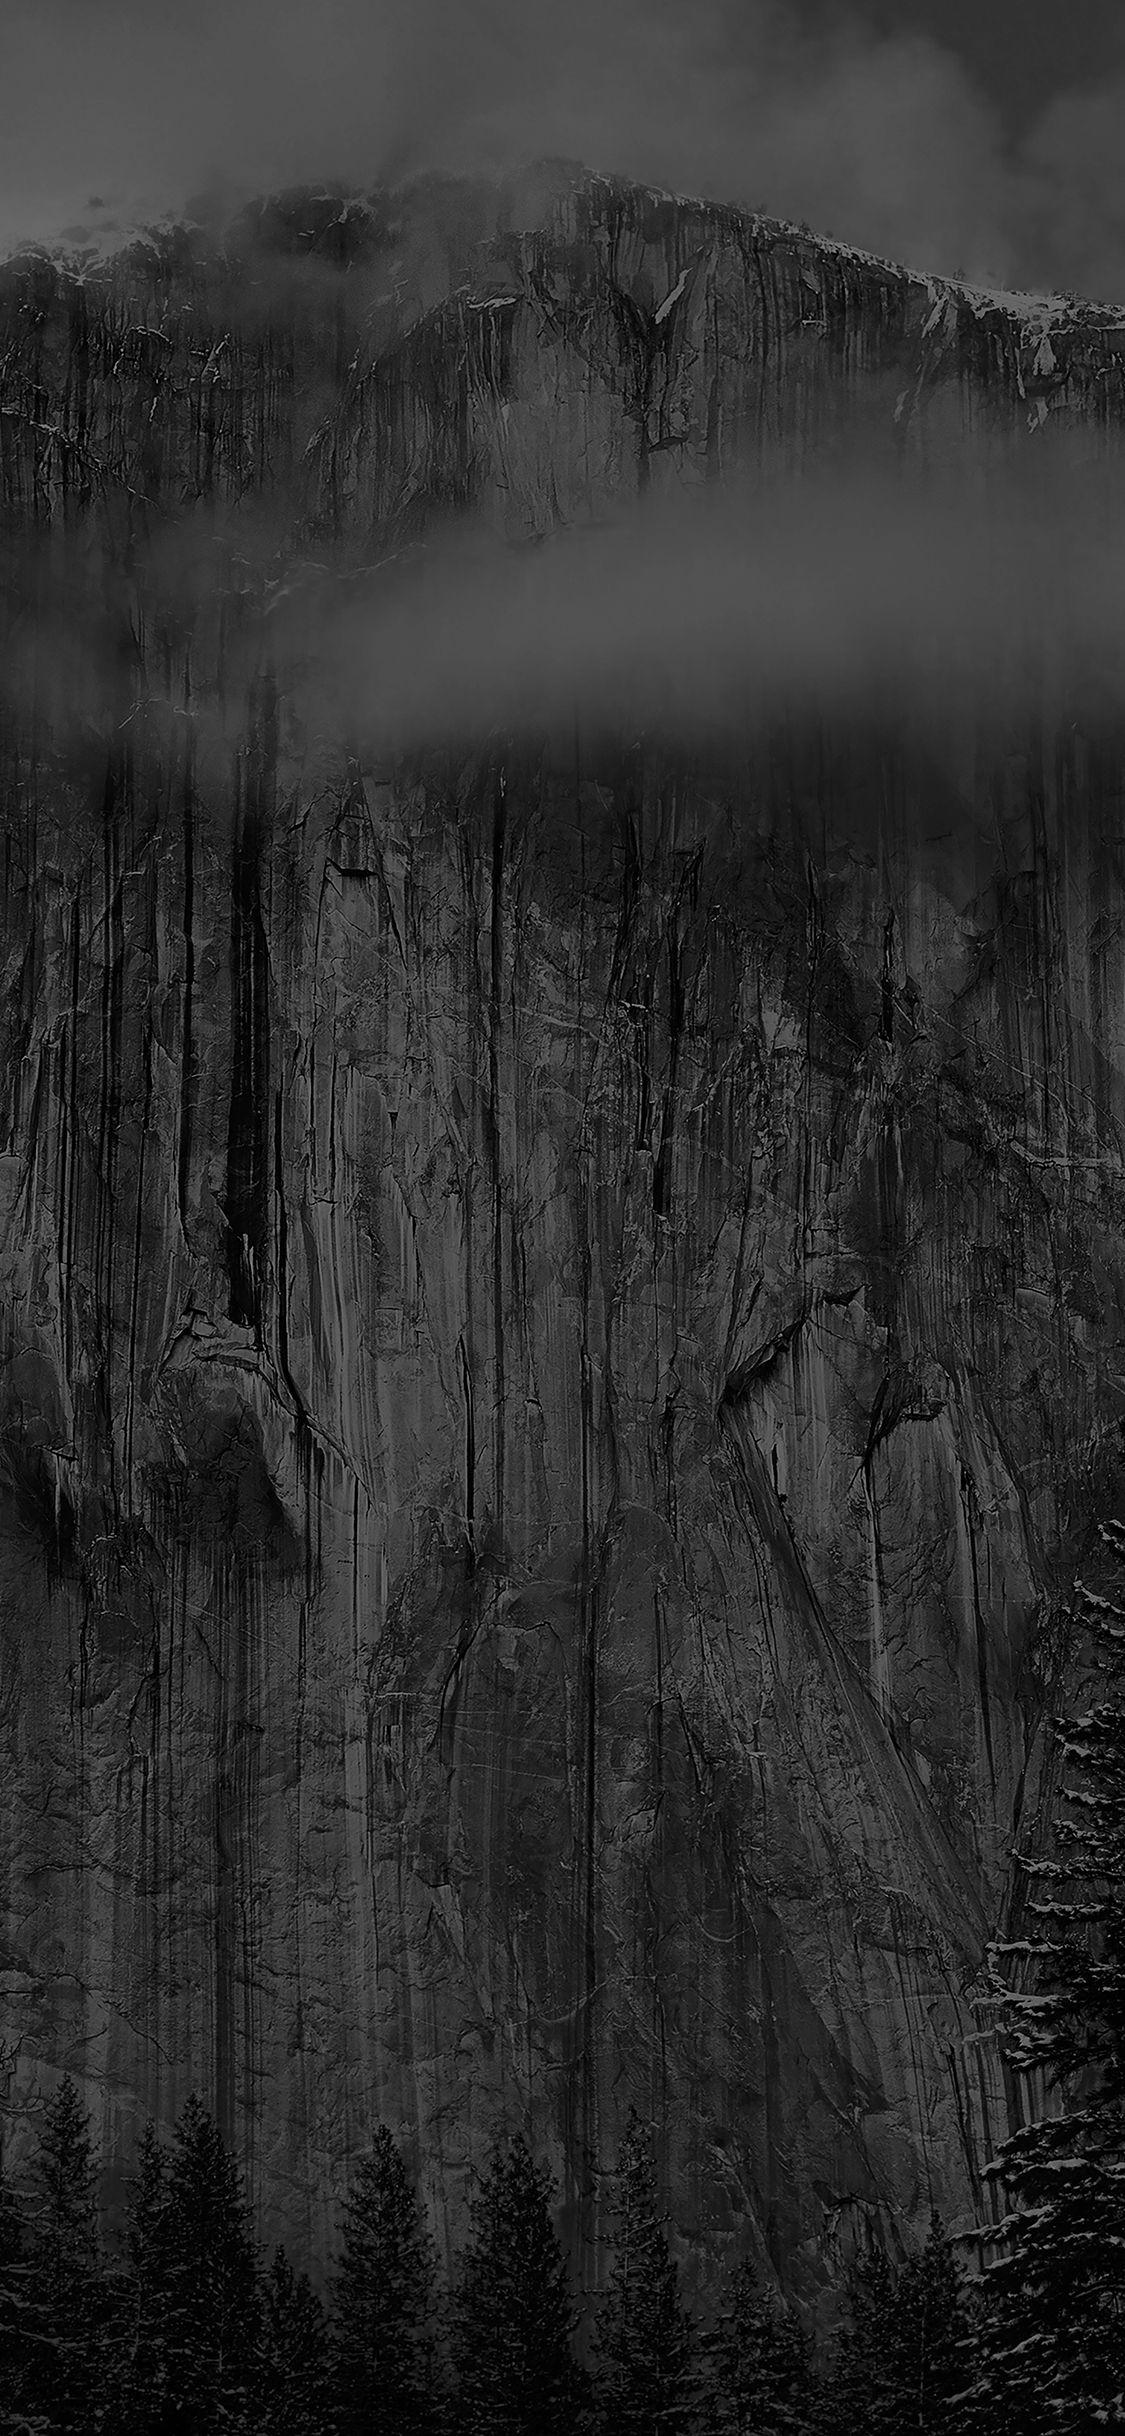 Top Wallpaper Macbook Yosemite - cce62e474fc9bdbd9cb05fc323d5484d  Collection_885157.jpg